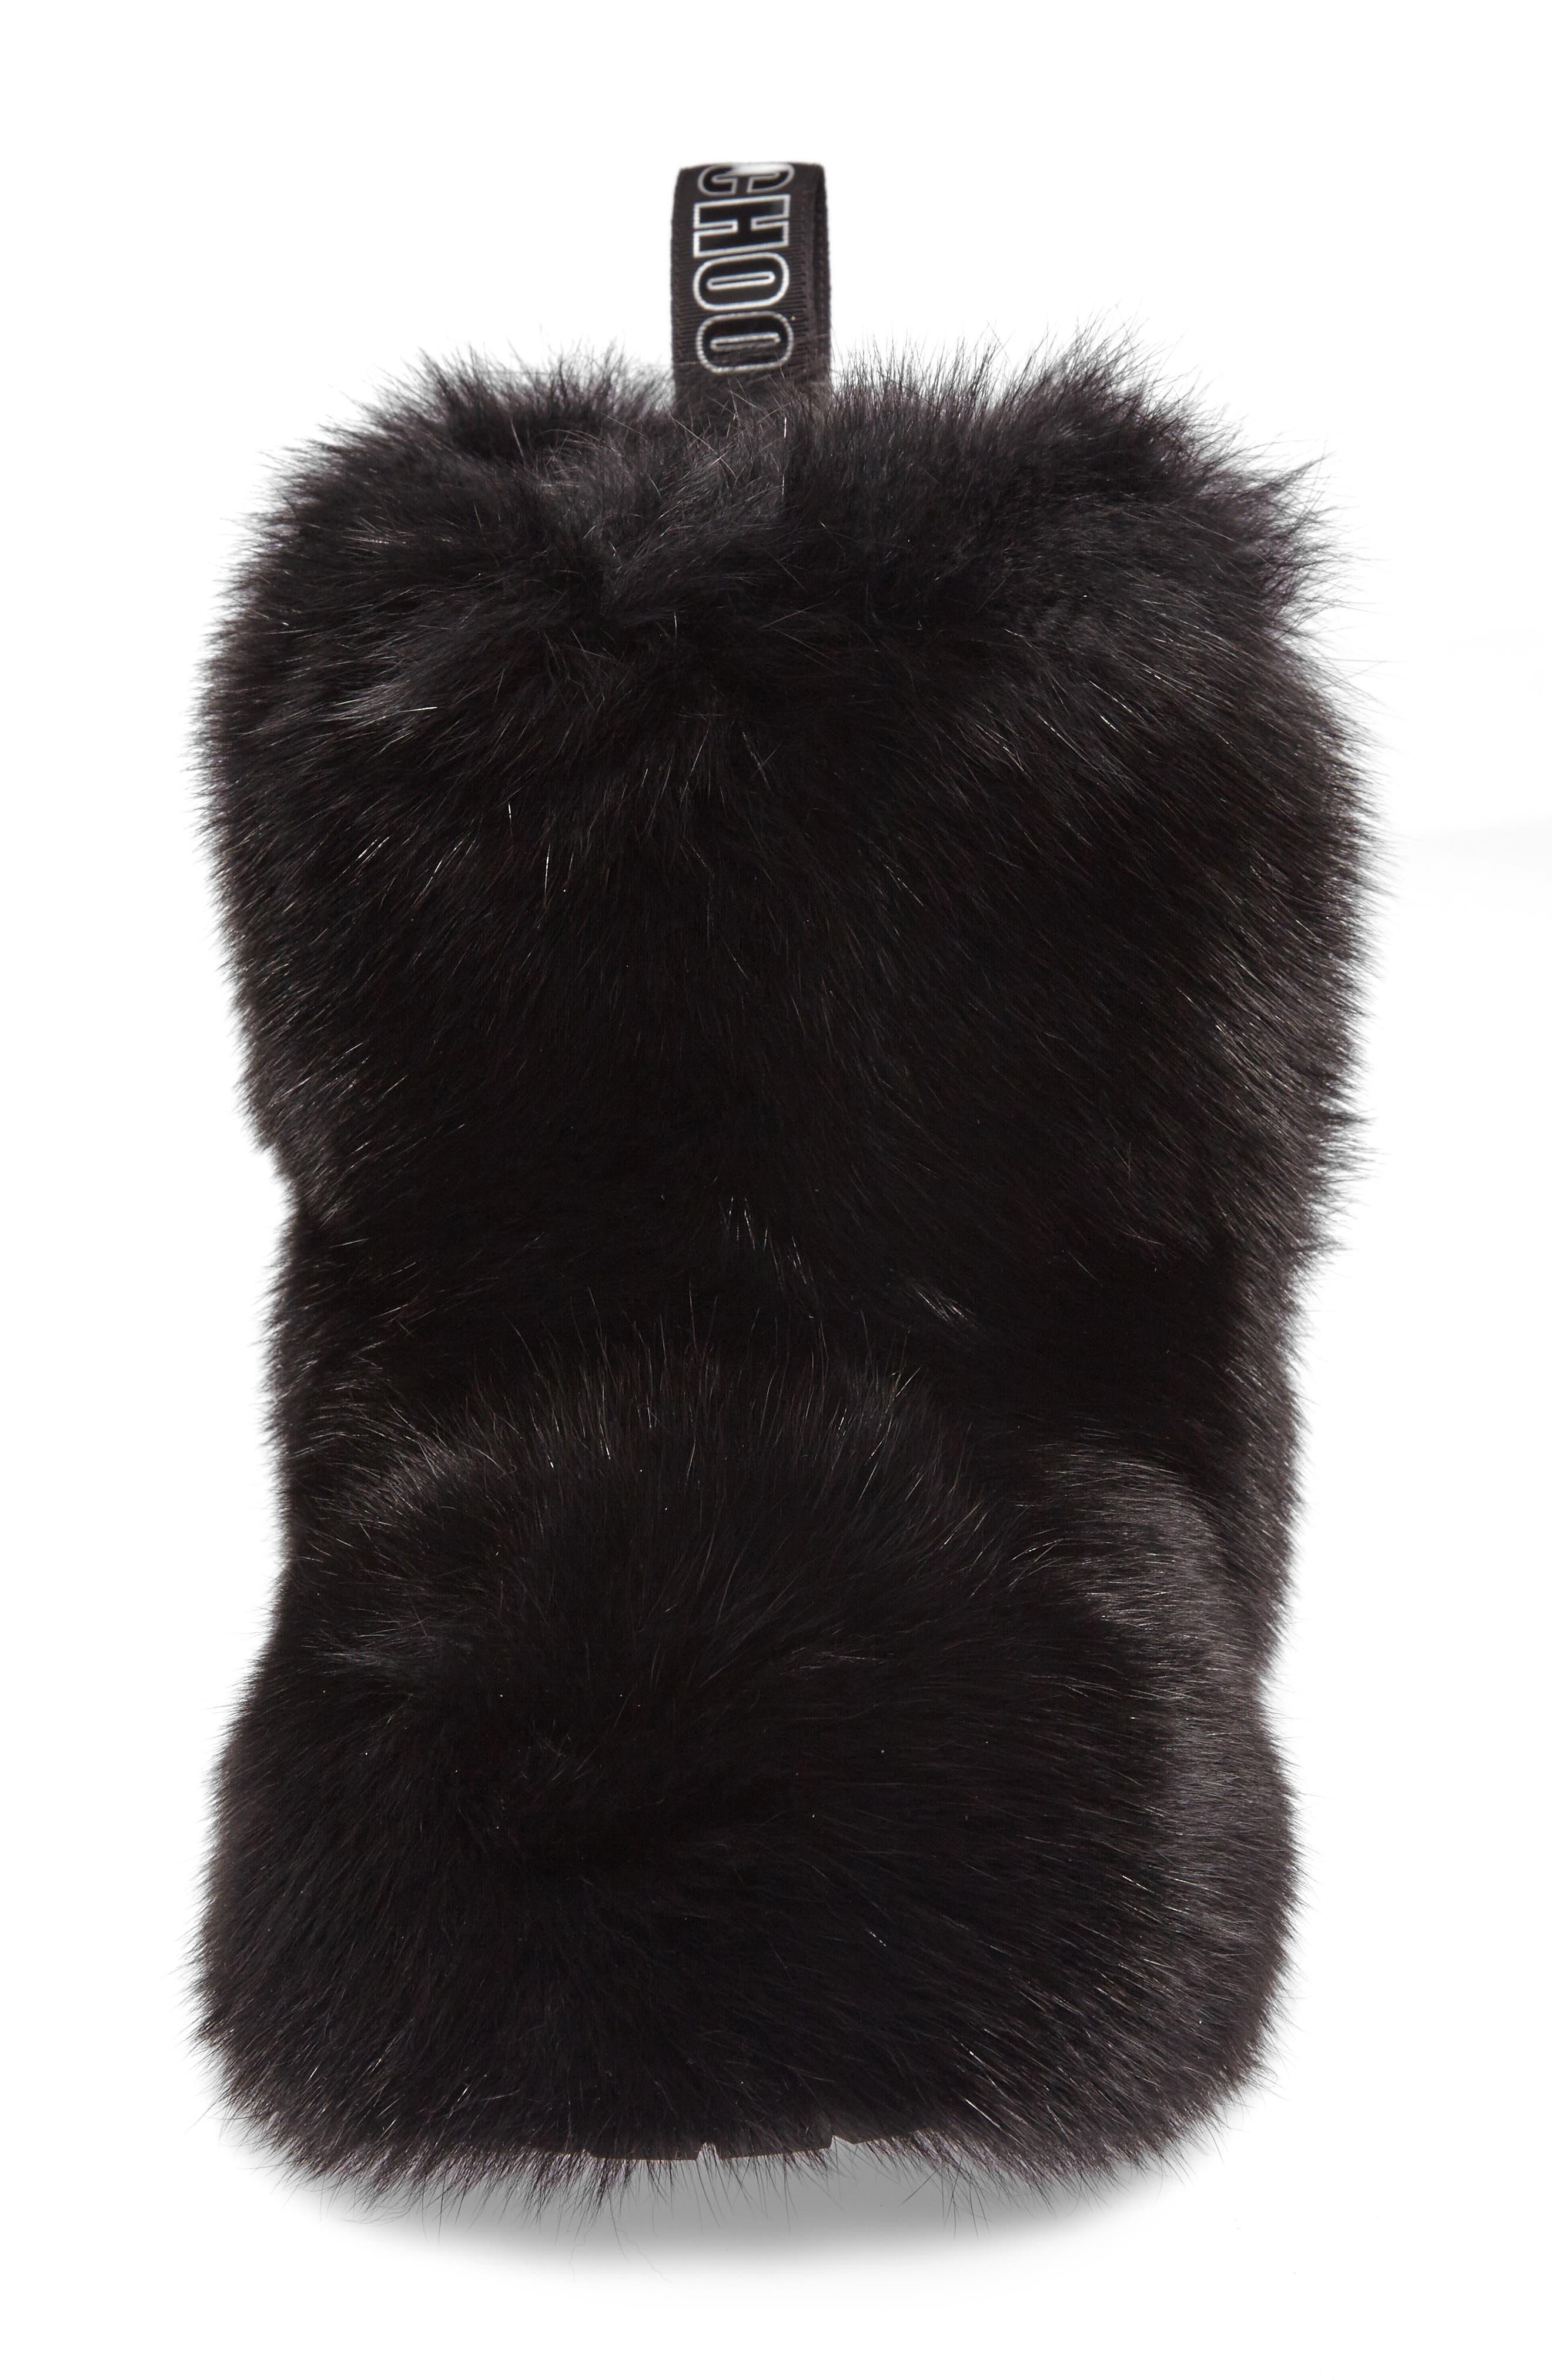 Dalton Genuine Fox & Rabbit Fur Bootie,                             Alternate thumbnail 4, color,                             001